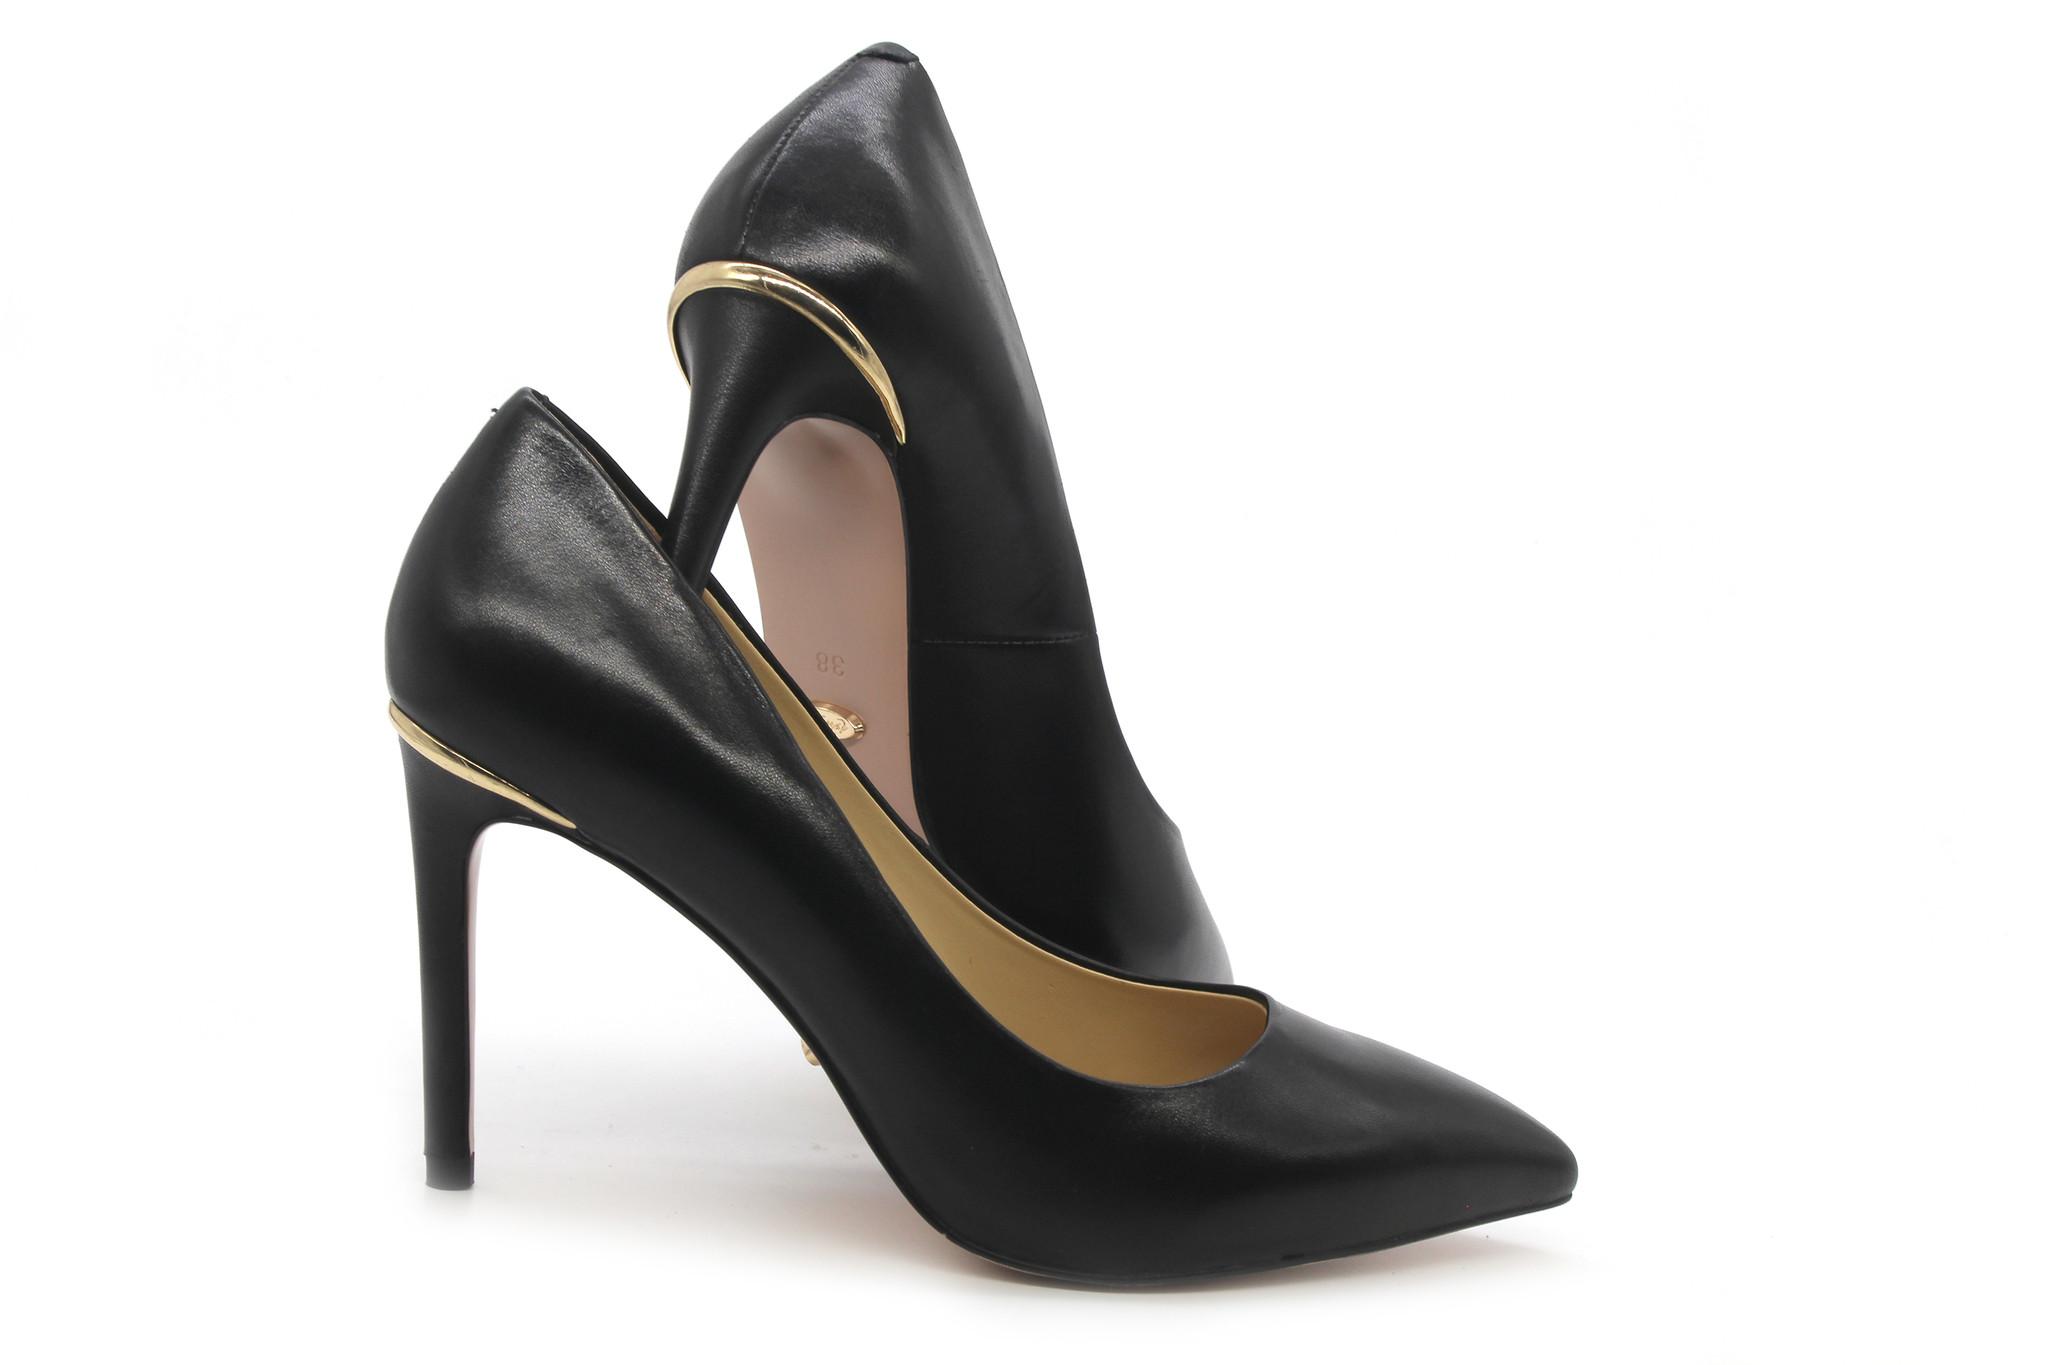 ac0c34452c7a 3 Inch Office Pumps - Classic Black Low Heels